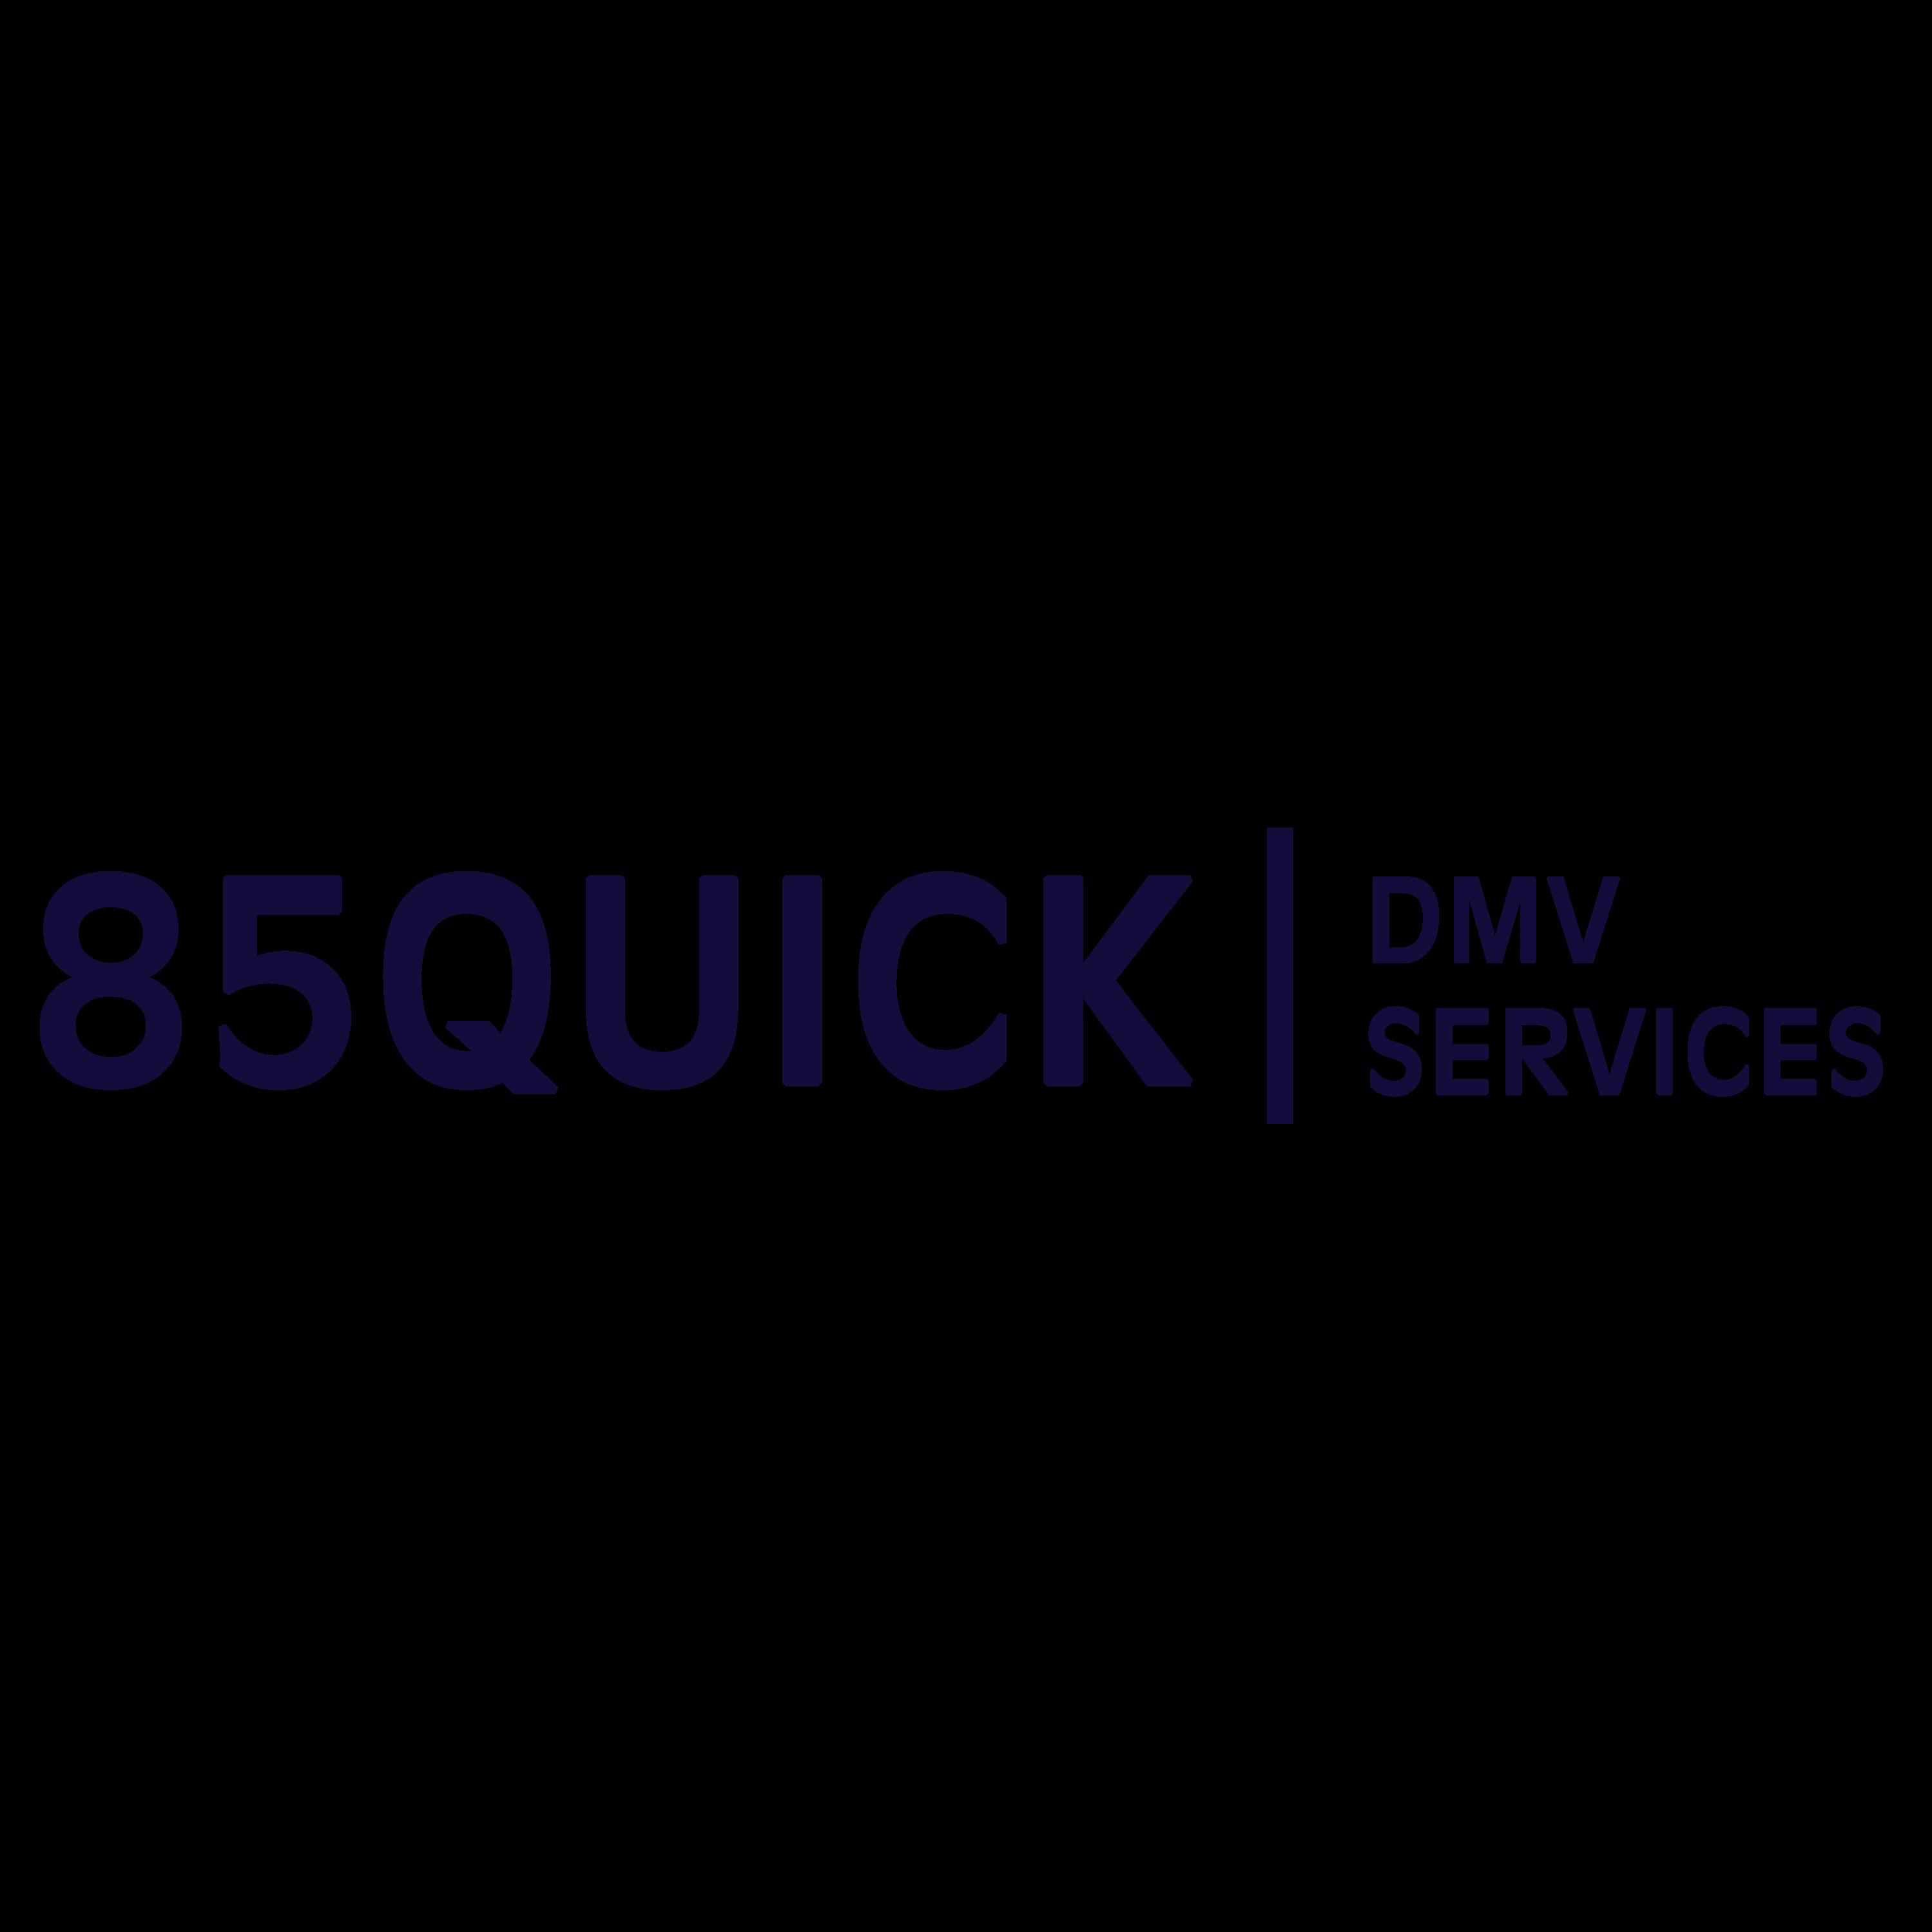 85Quick DMV Services image 2